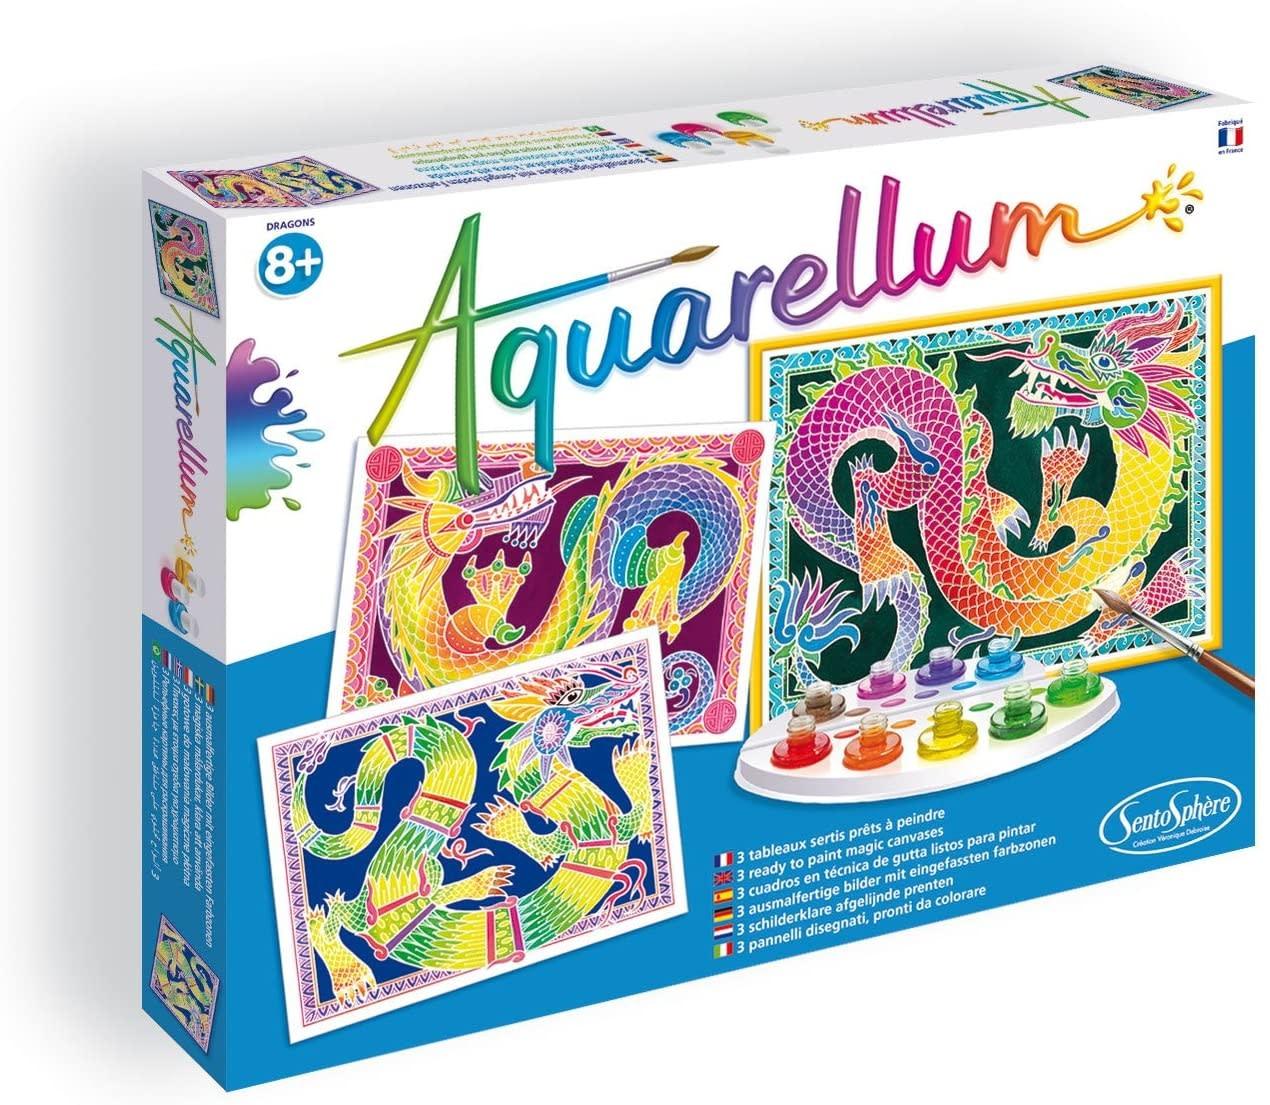 Aquarellum Dragons Large Painting Set by Sentosphere